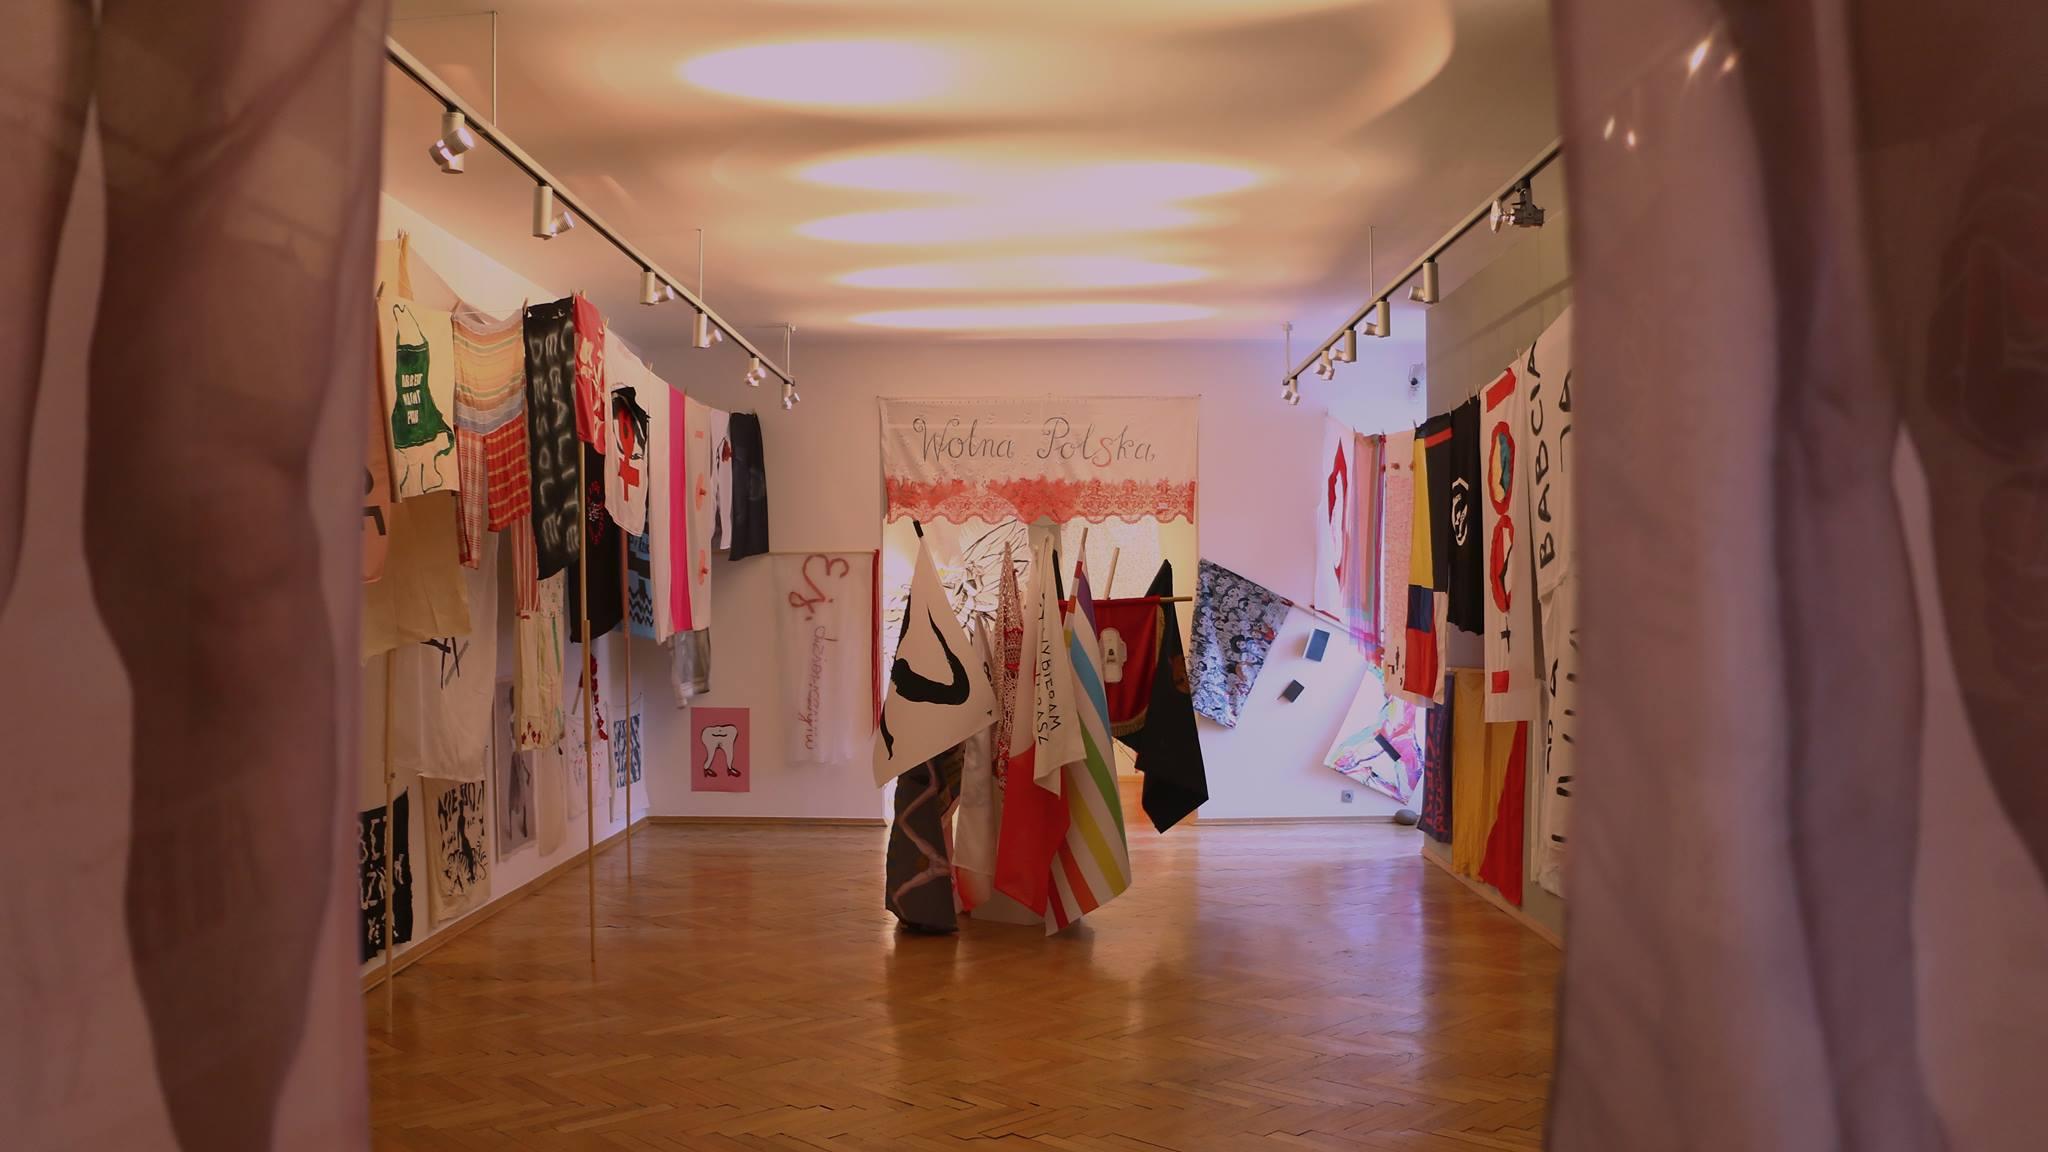 Dziewuchy Berlin @ Exhibition of 100 Flags in Warsaw